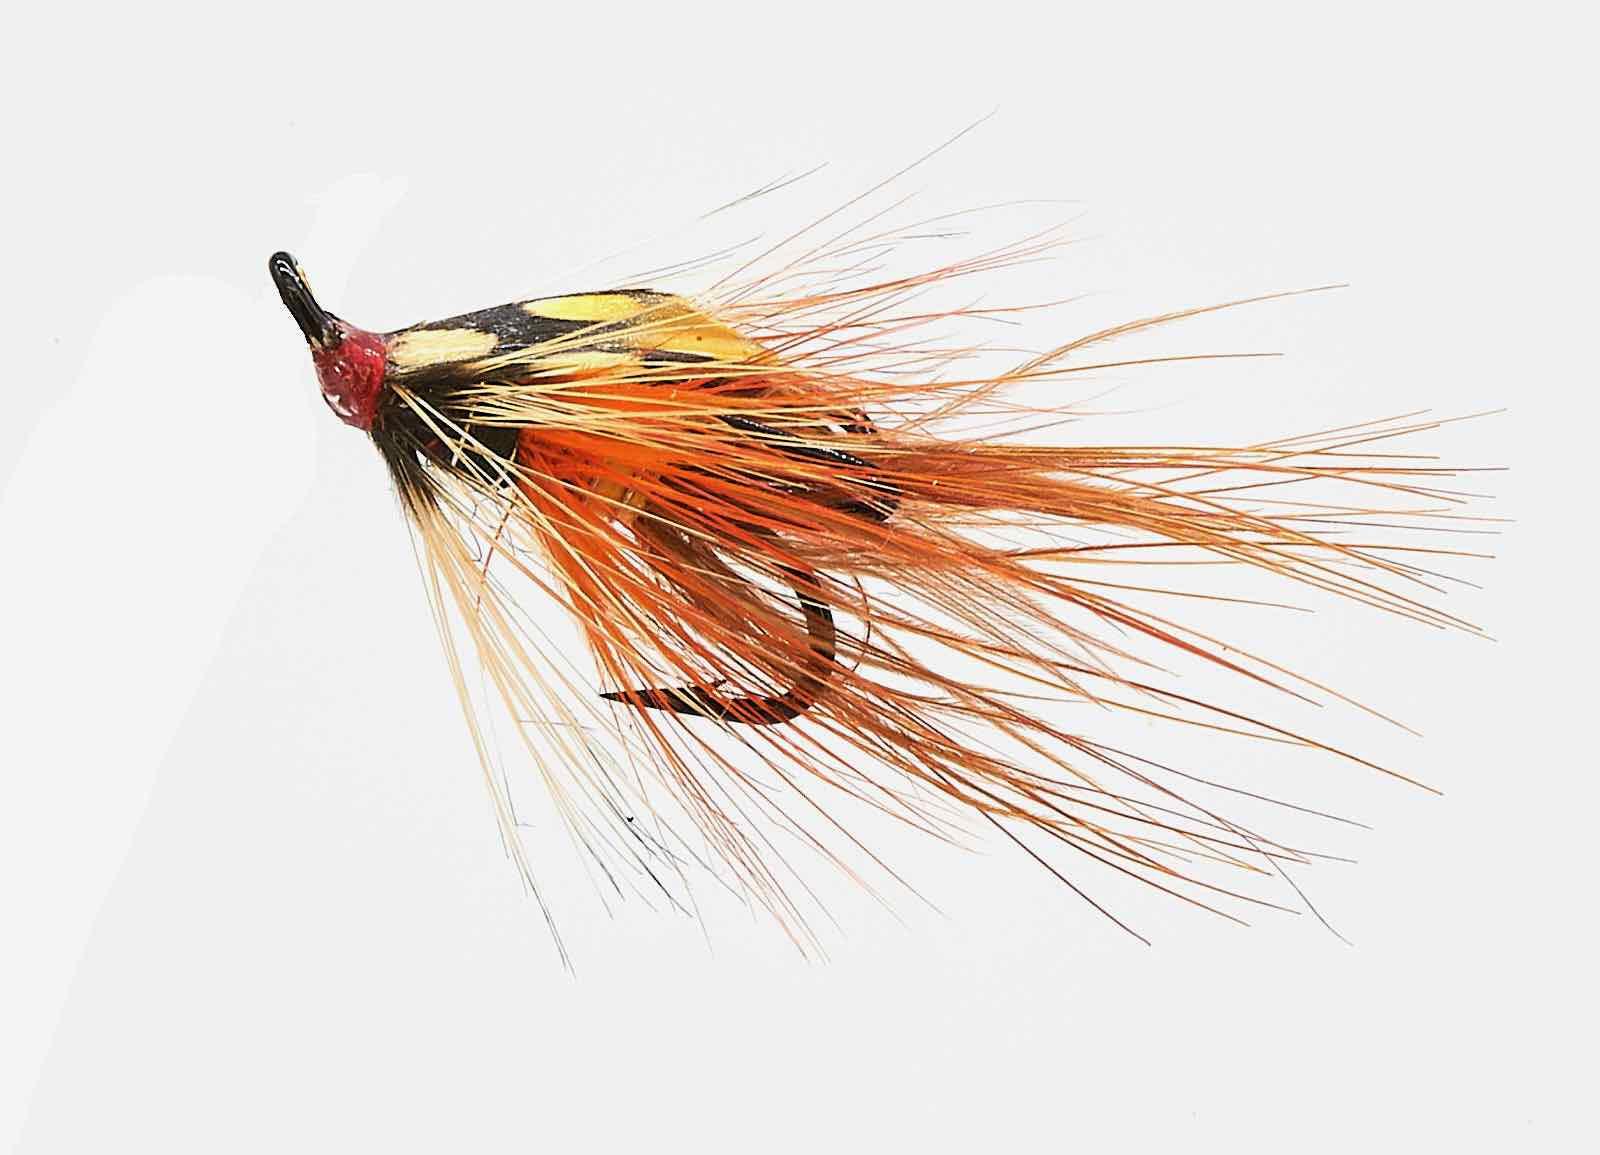 HF2412 Bann Special Treble Hook #12